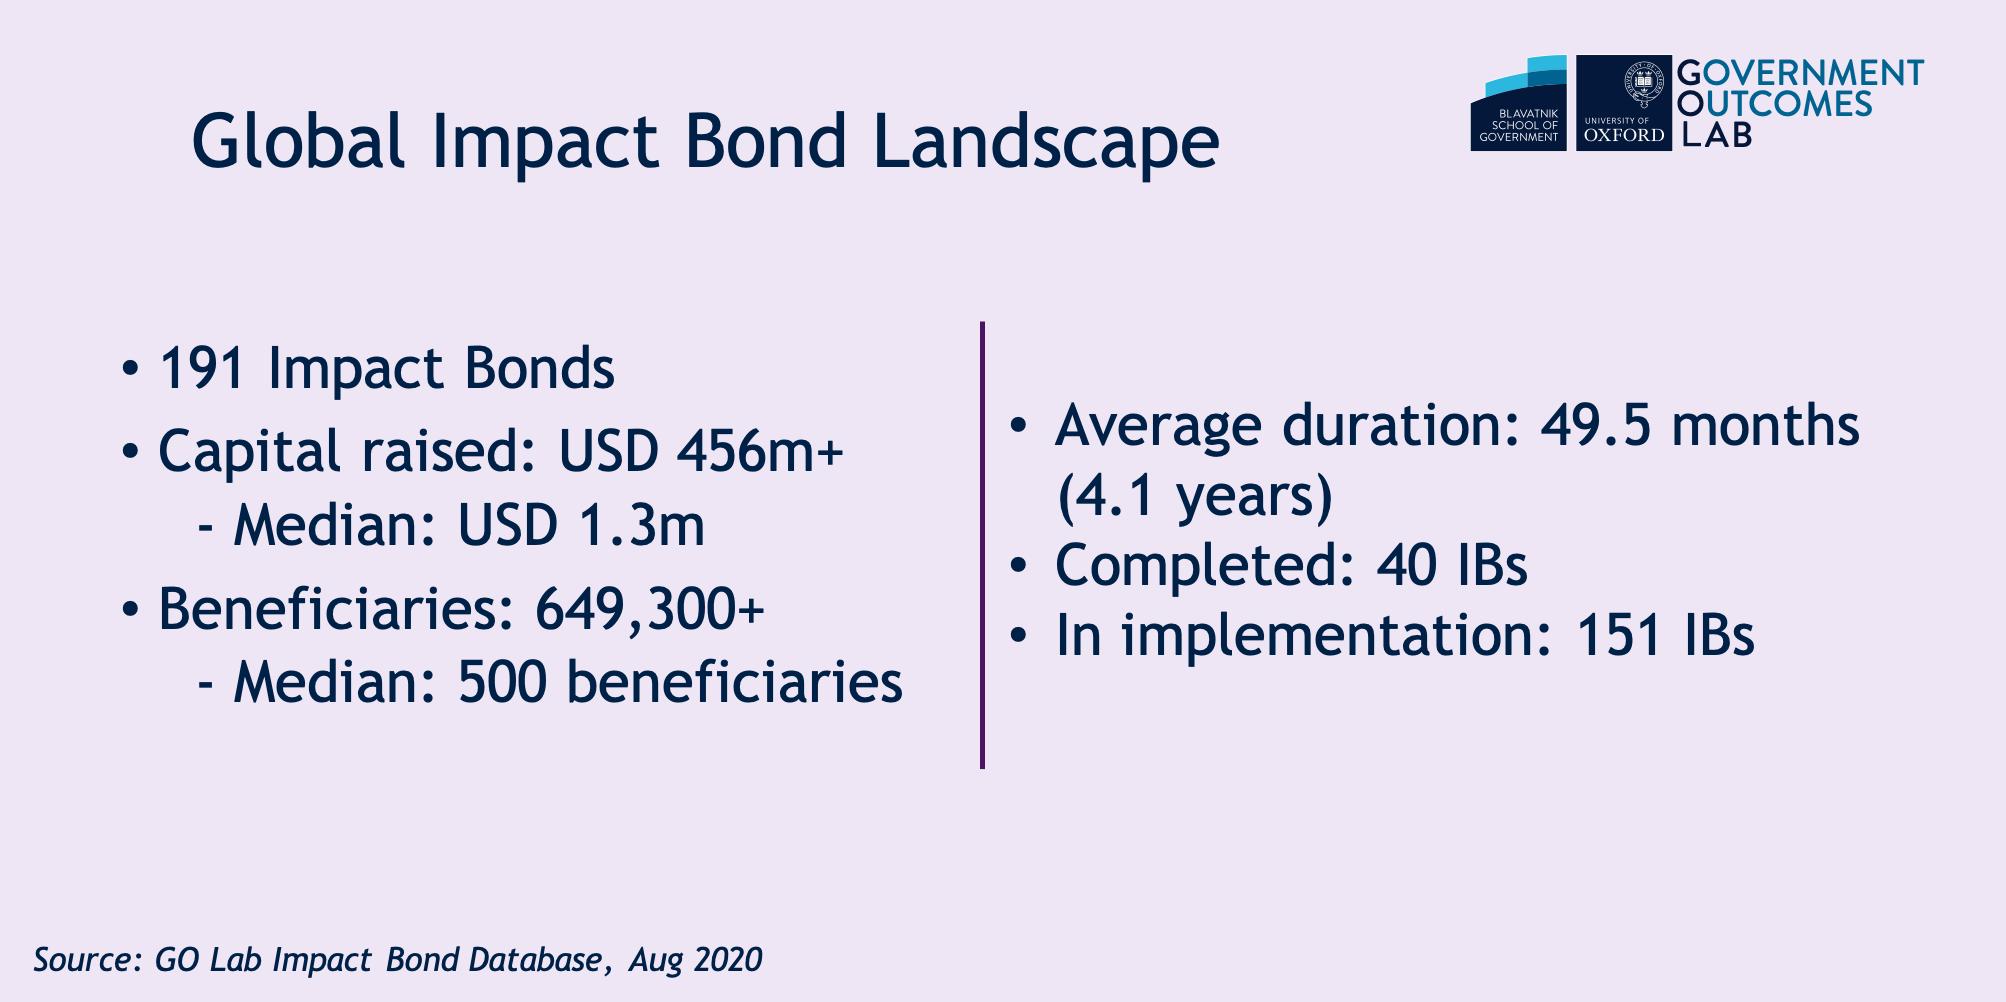 global impact bonds landscape .png